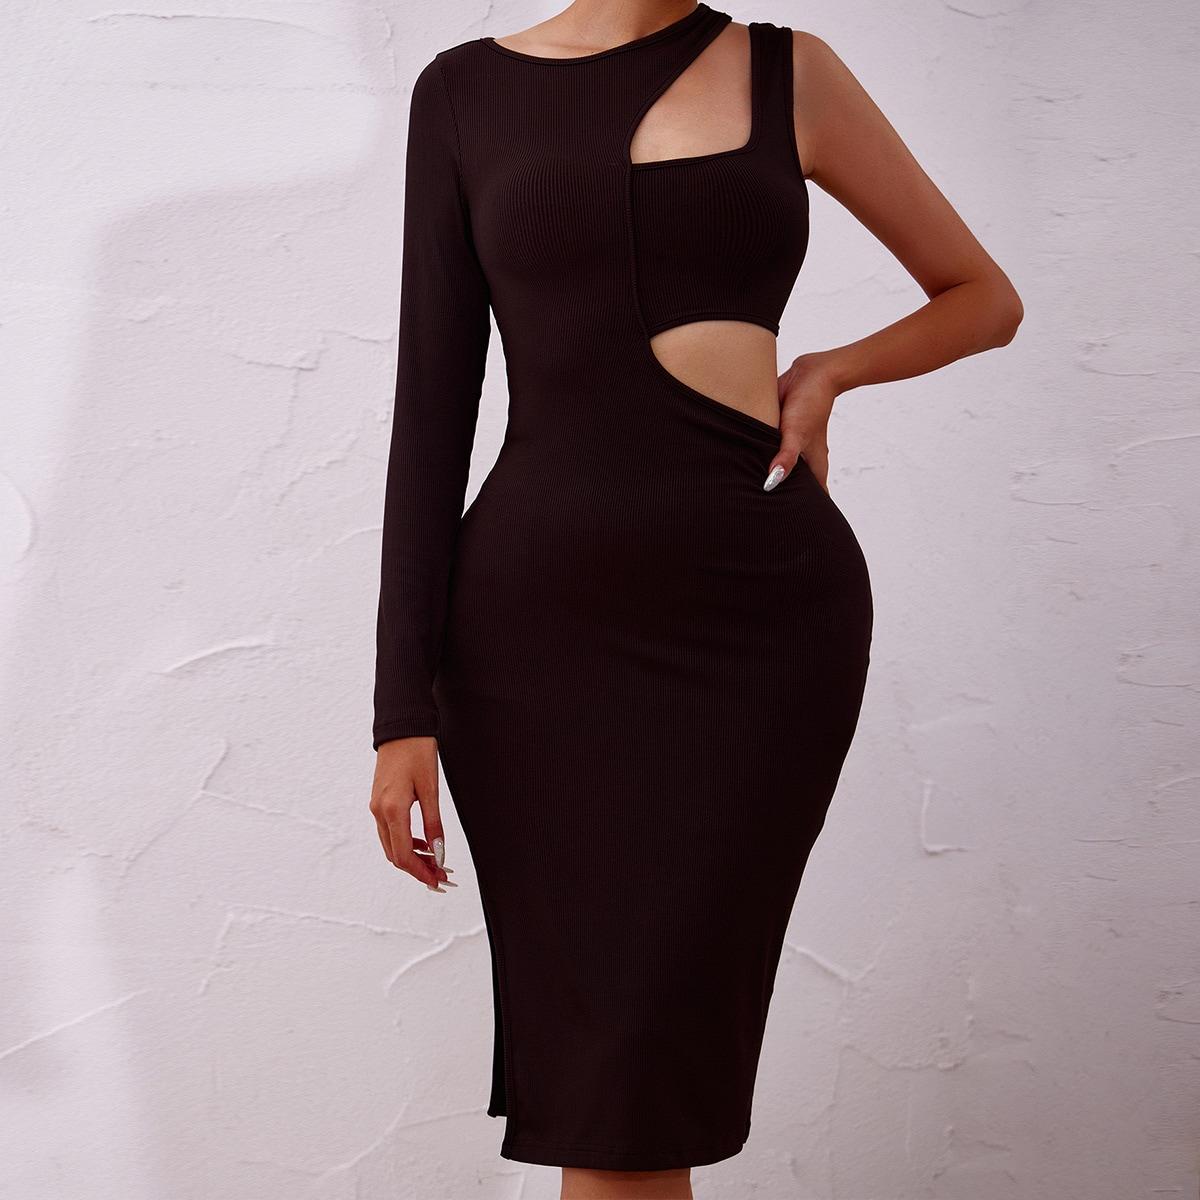 Cut Out Asymmetrical Neck Slit Thigh Bodycon Dress